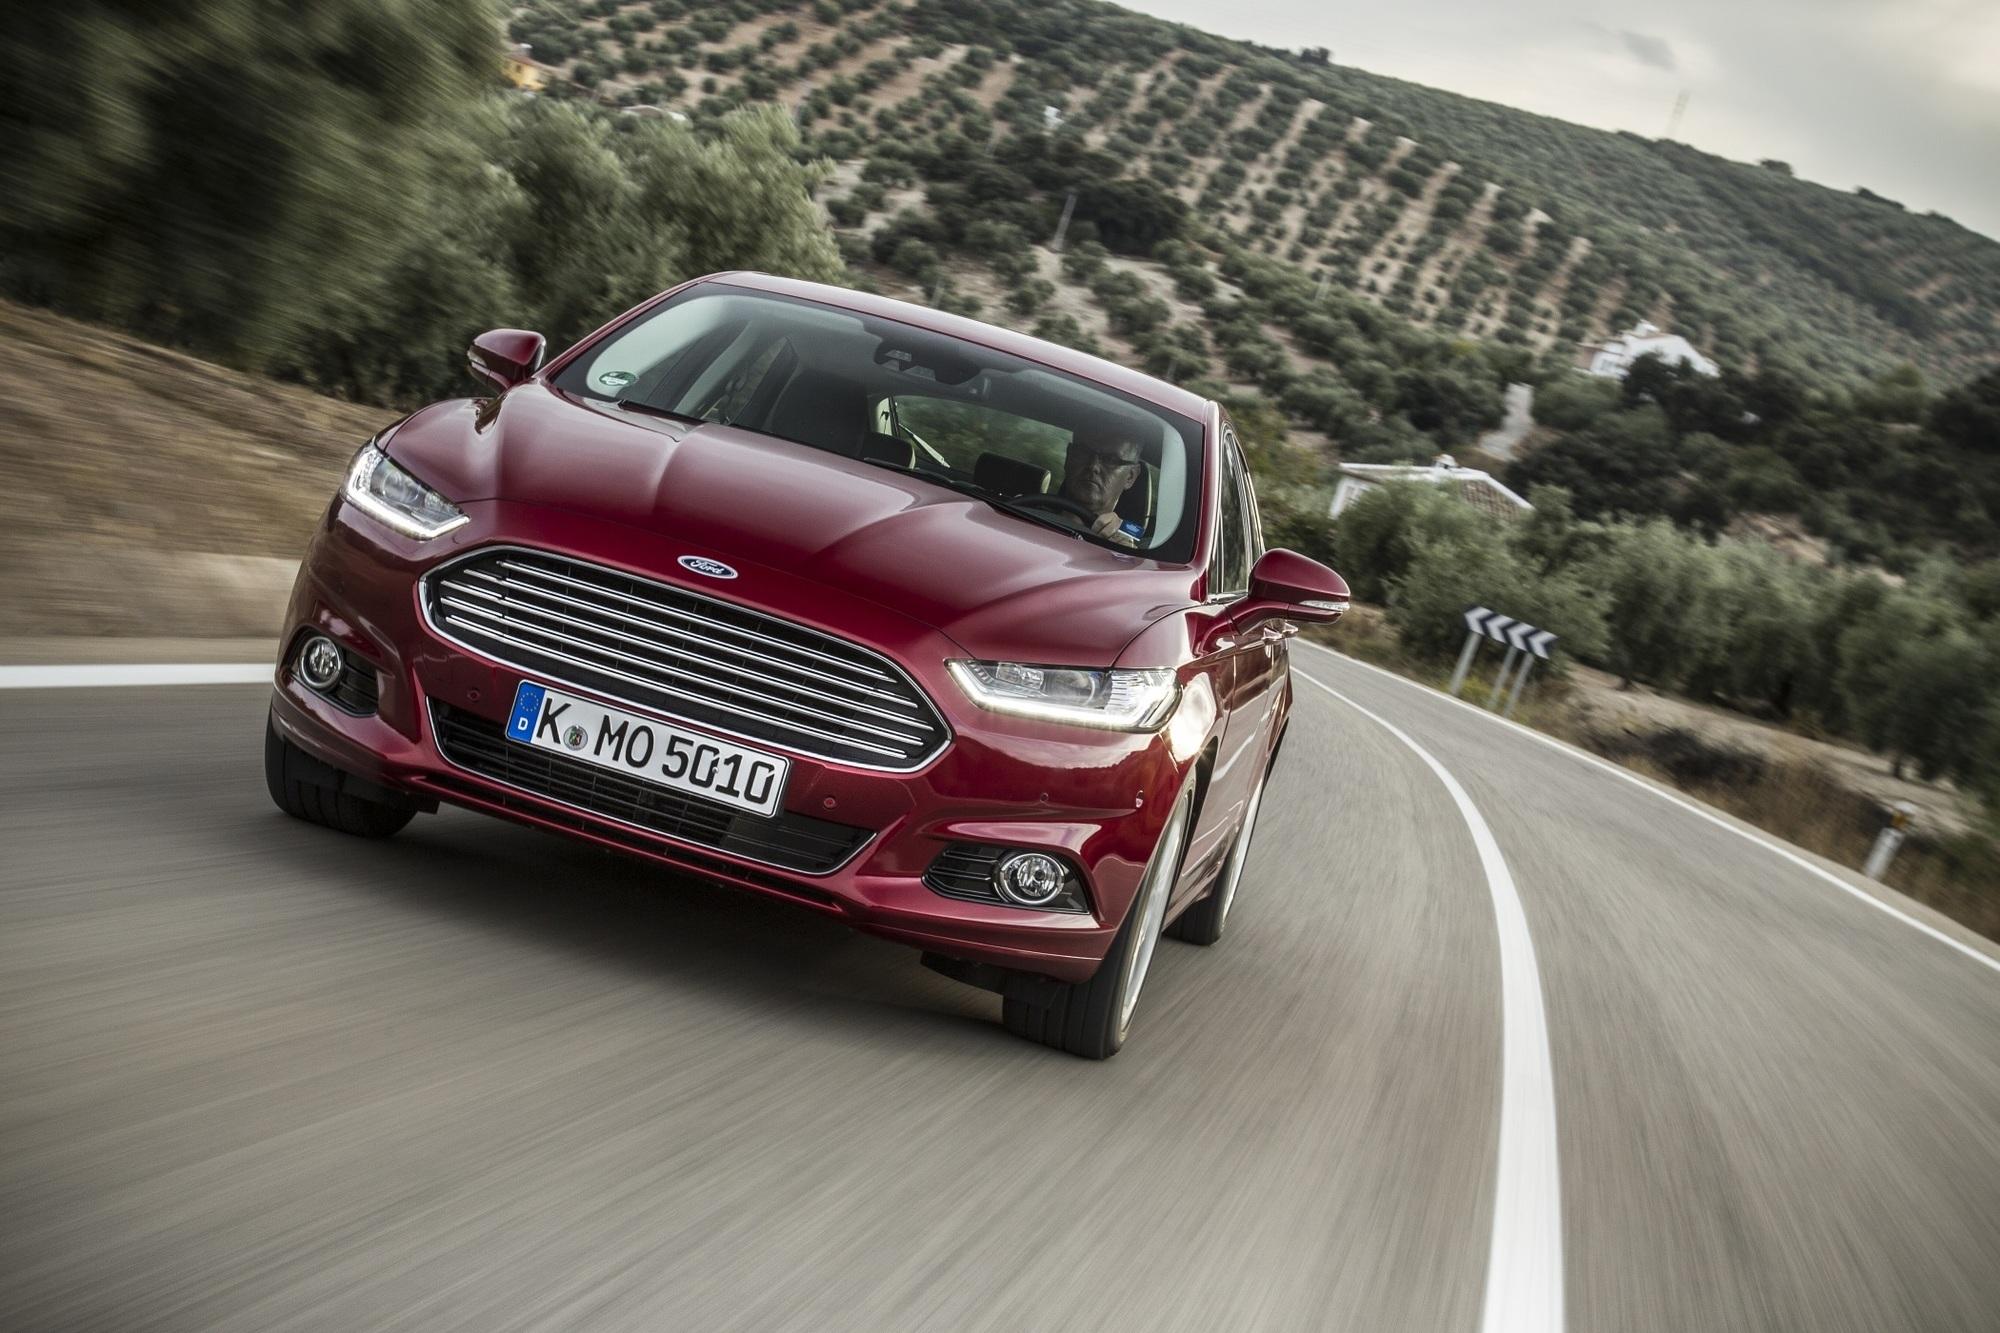 Fahrbericht: Ford Mondeo - Spät dran - gut drauf